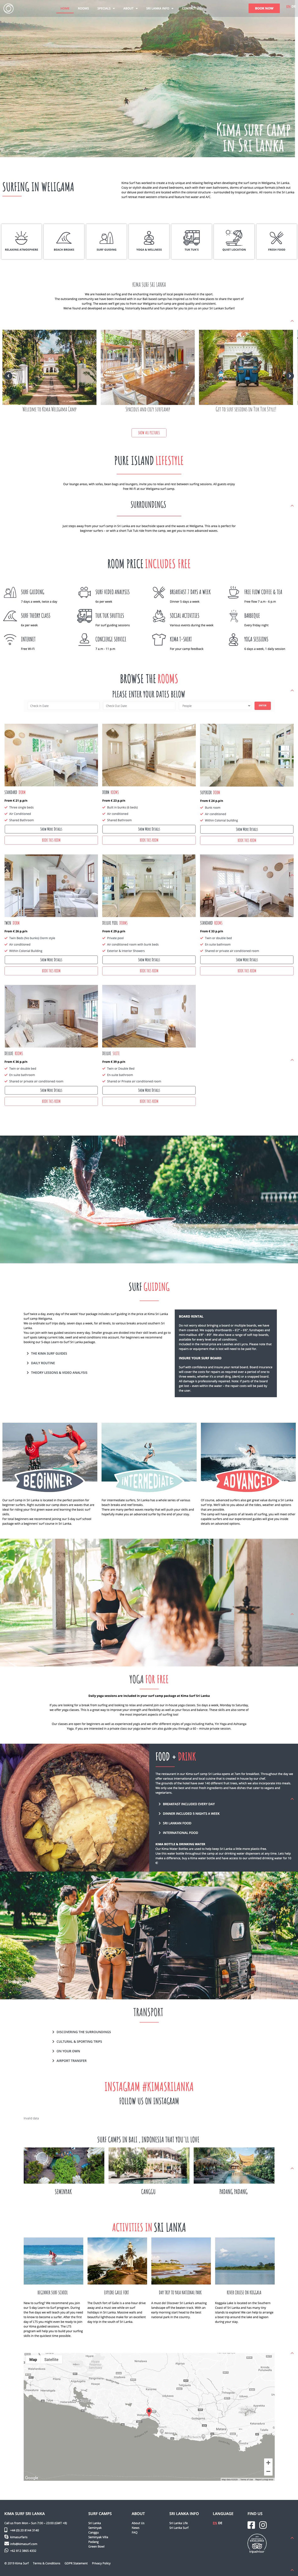 Kima Surf Sri Lanka